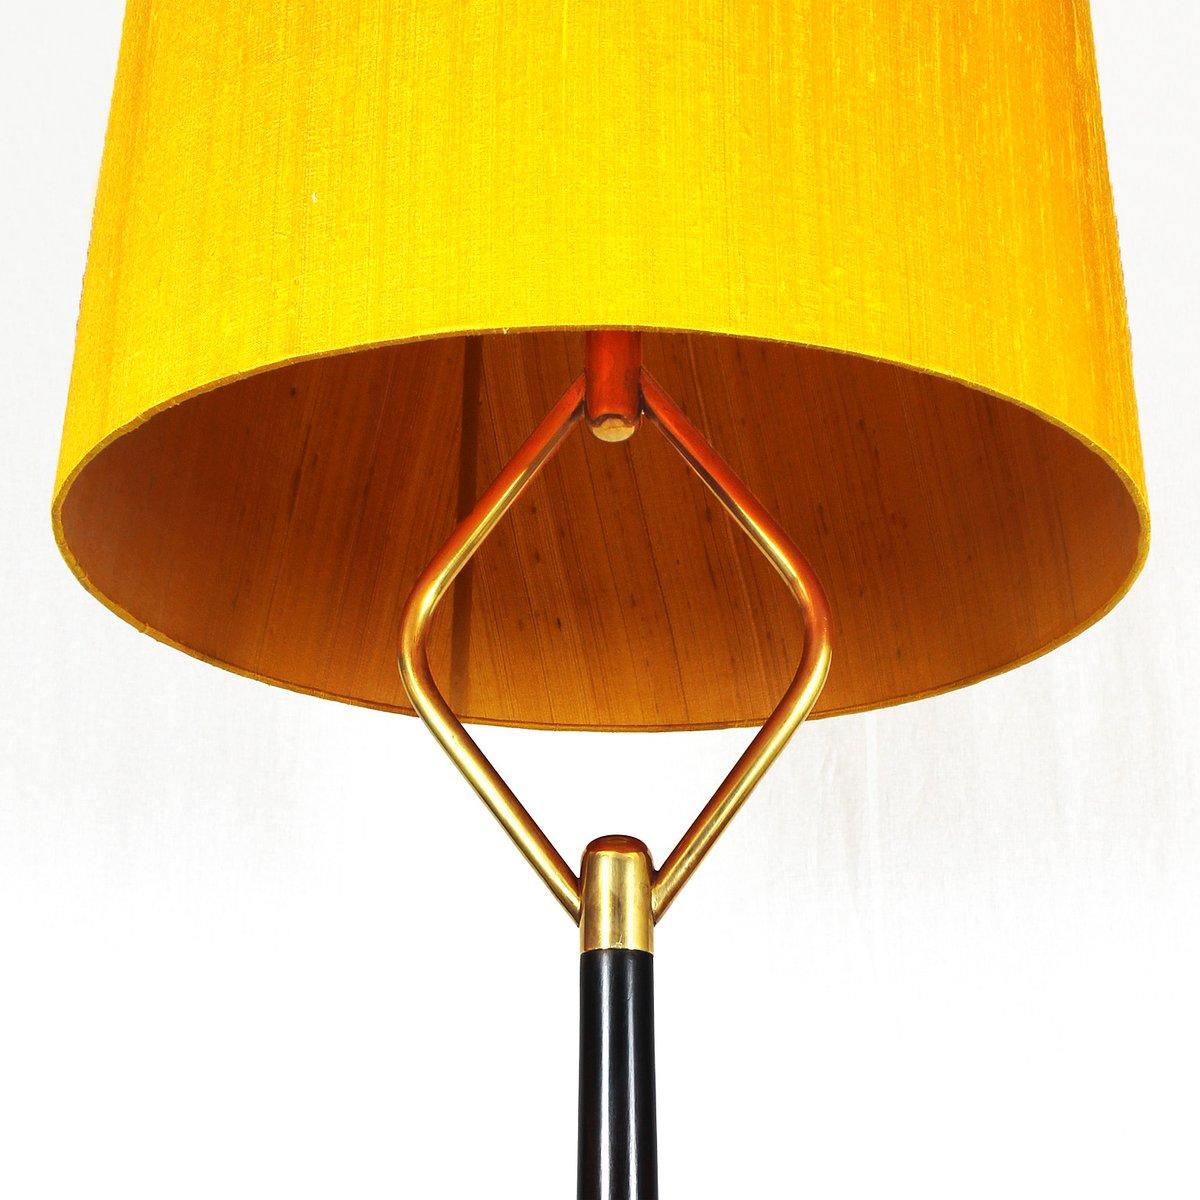 italienische mahagoni stehlampe 1940er bei pamono kaufen. Black Bedroom Furniture Sets. Home Design Ideas